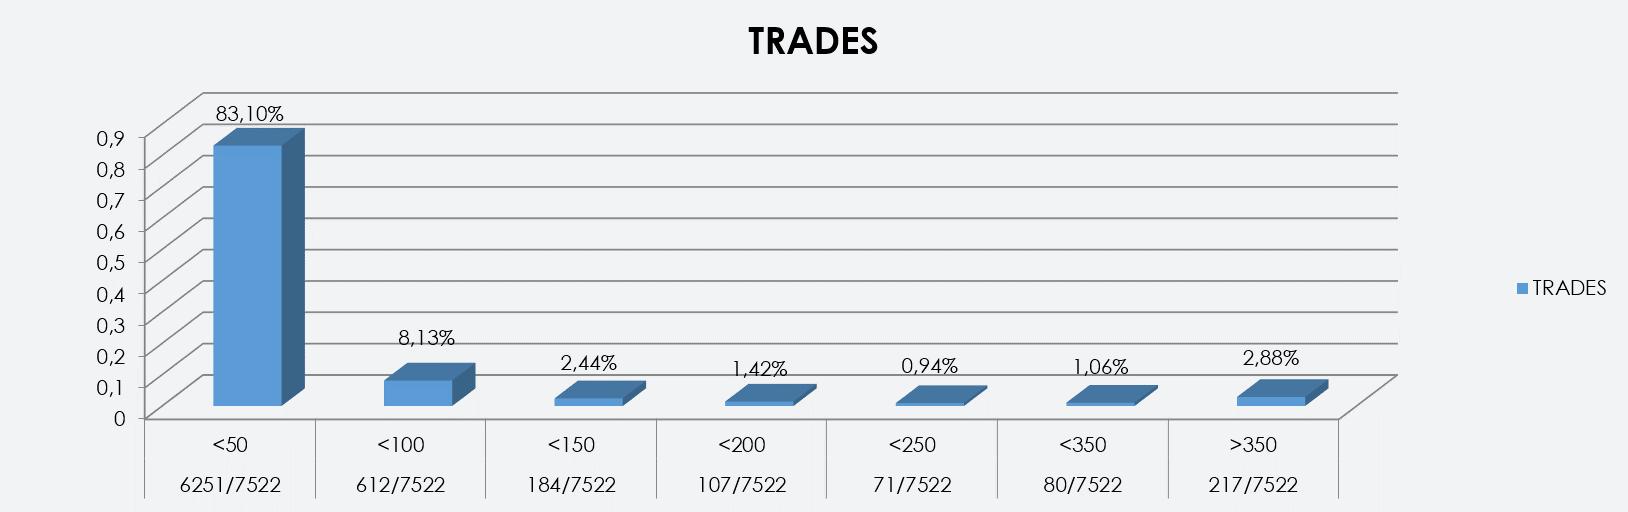 trades-new